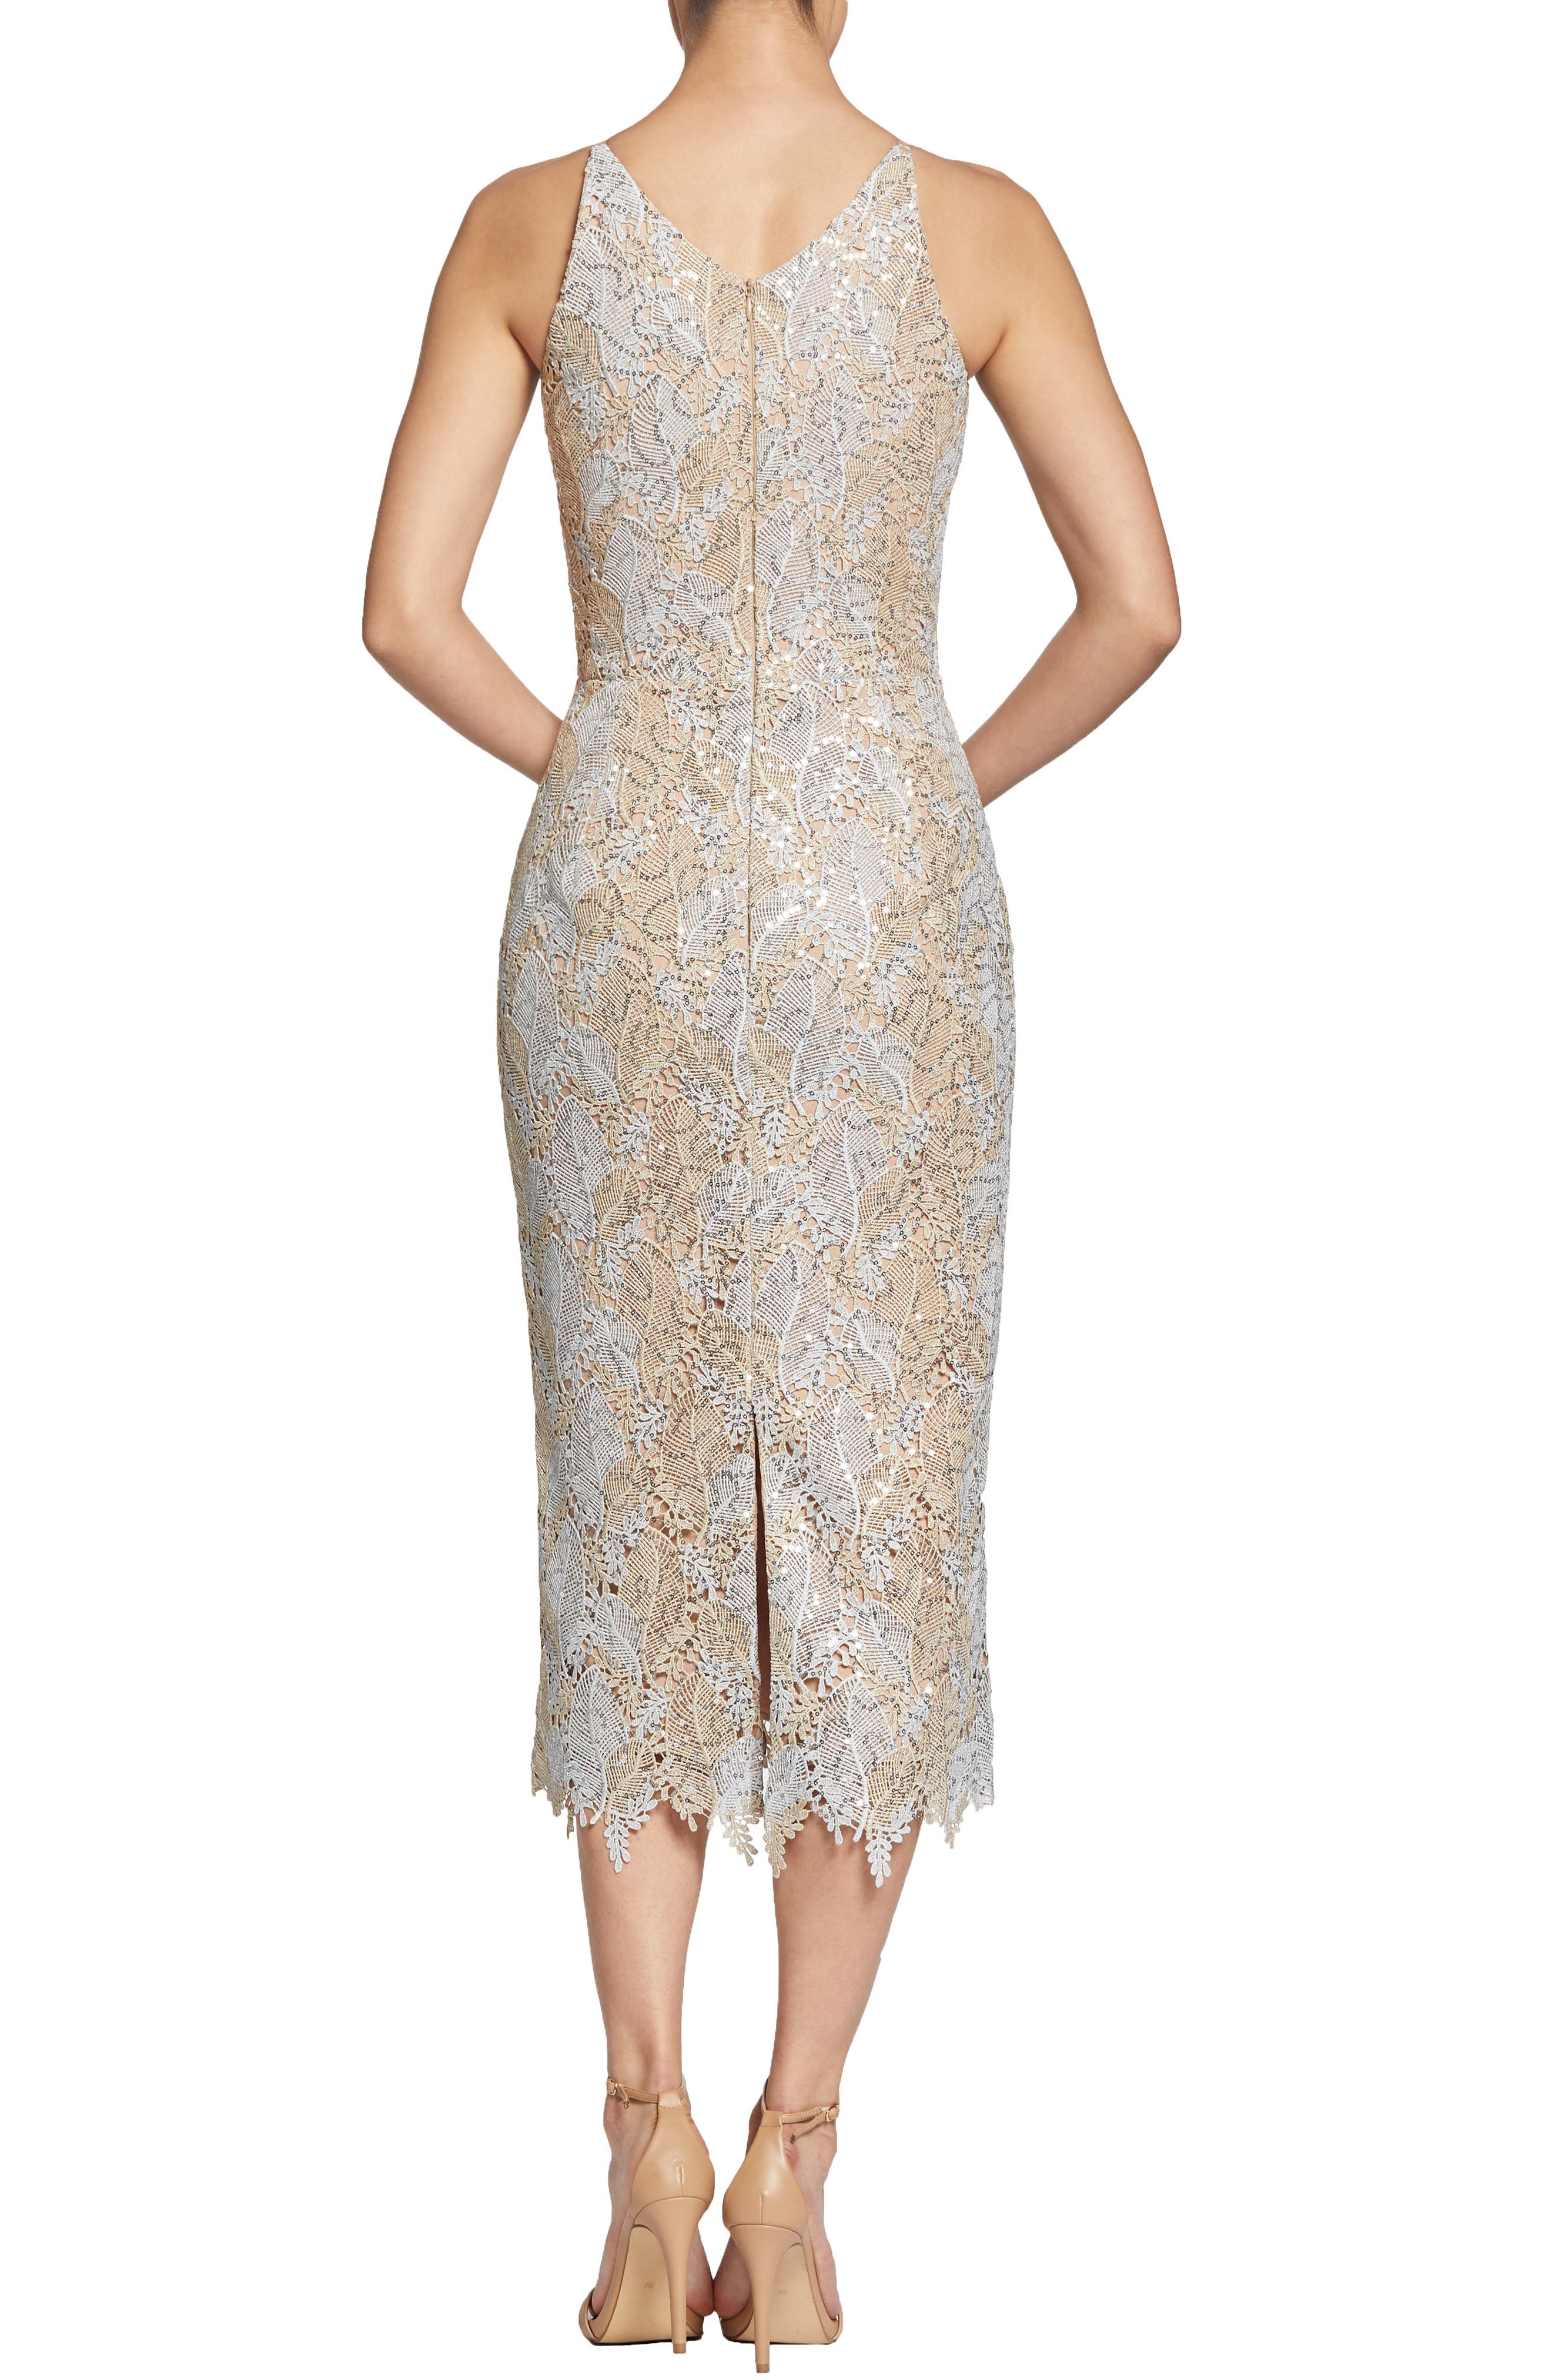 DRESS THE POPULATION, Aurora Lace Sheath Dress, Alternate thumbnail 2, color, PLATINUM/ GOLD